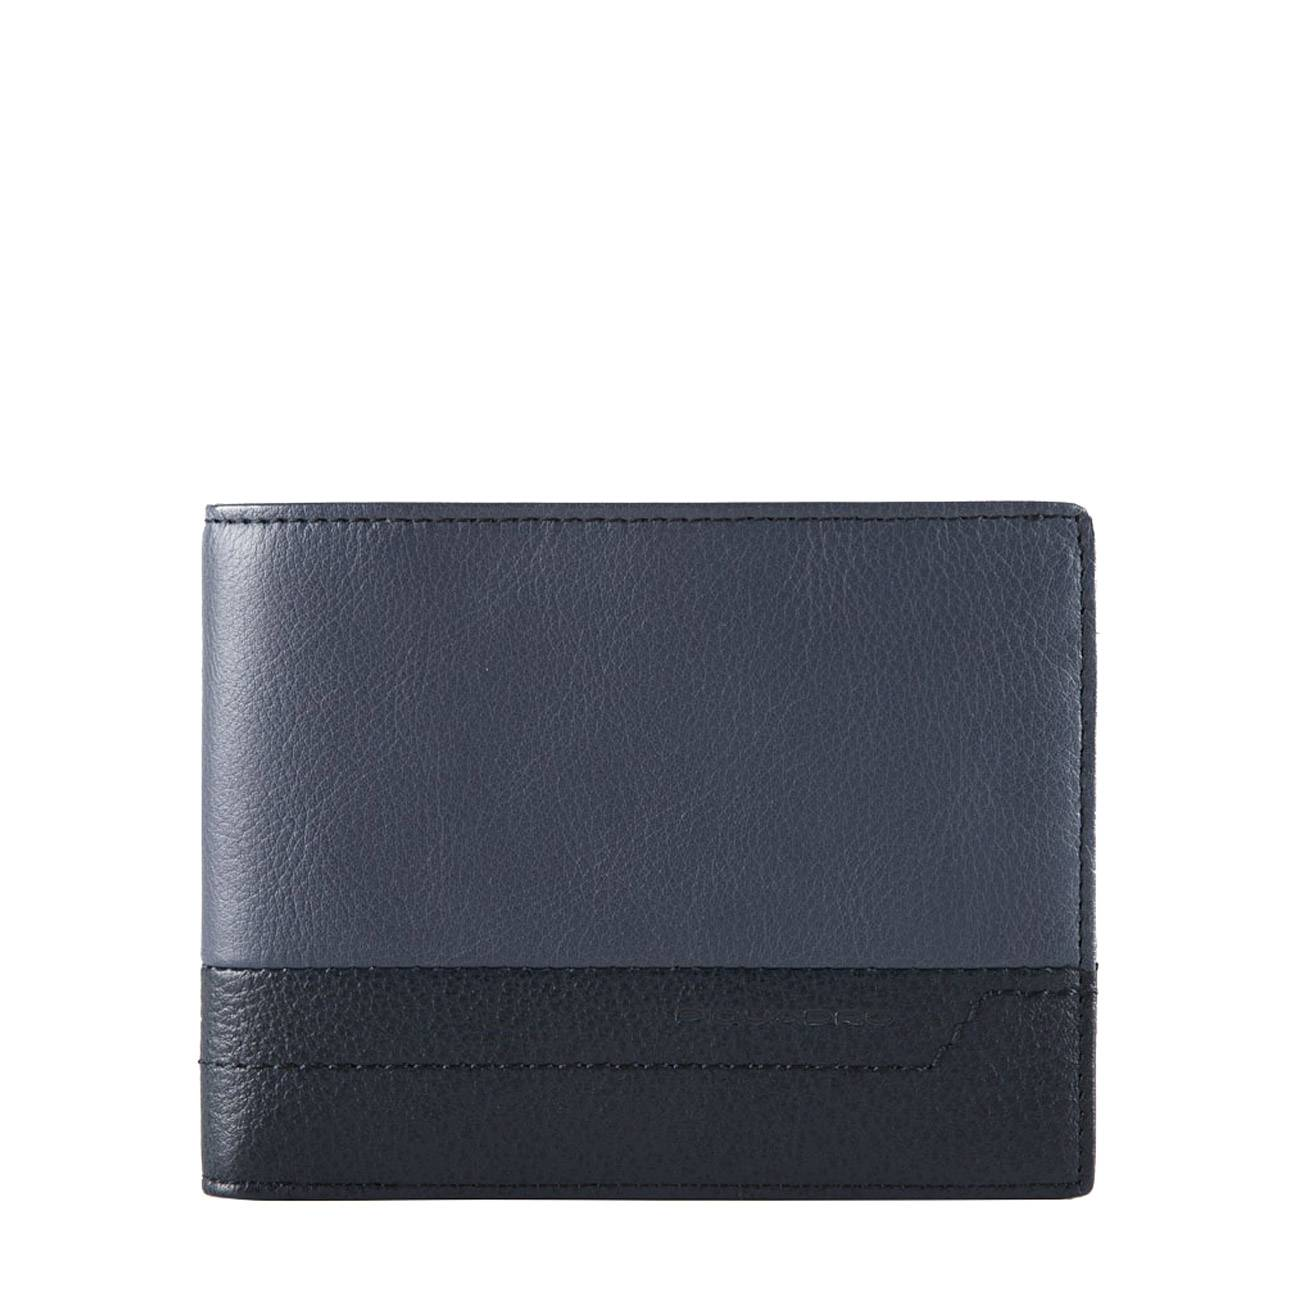 PAN CREDIT CARD WALLET